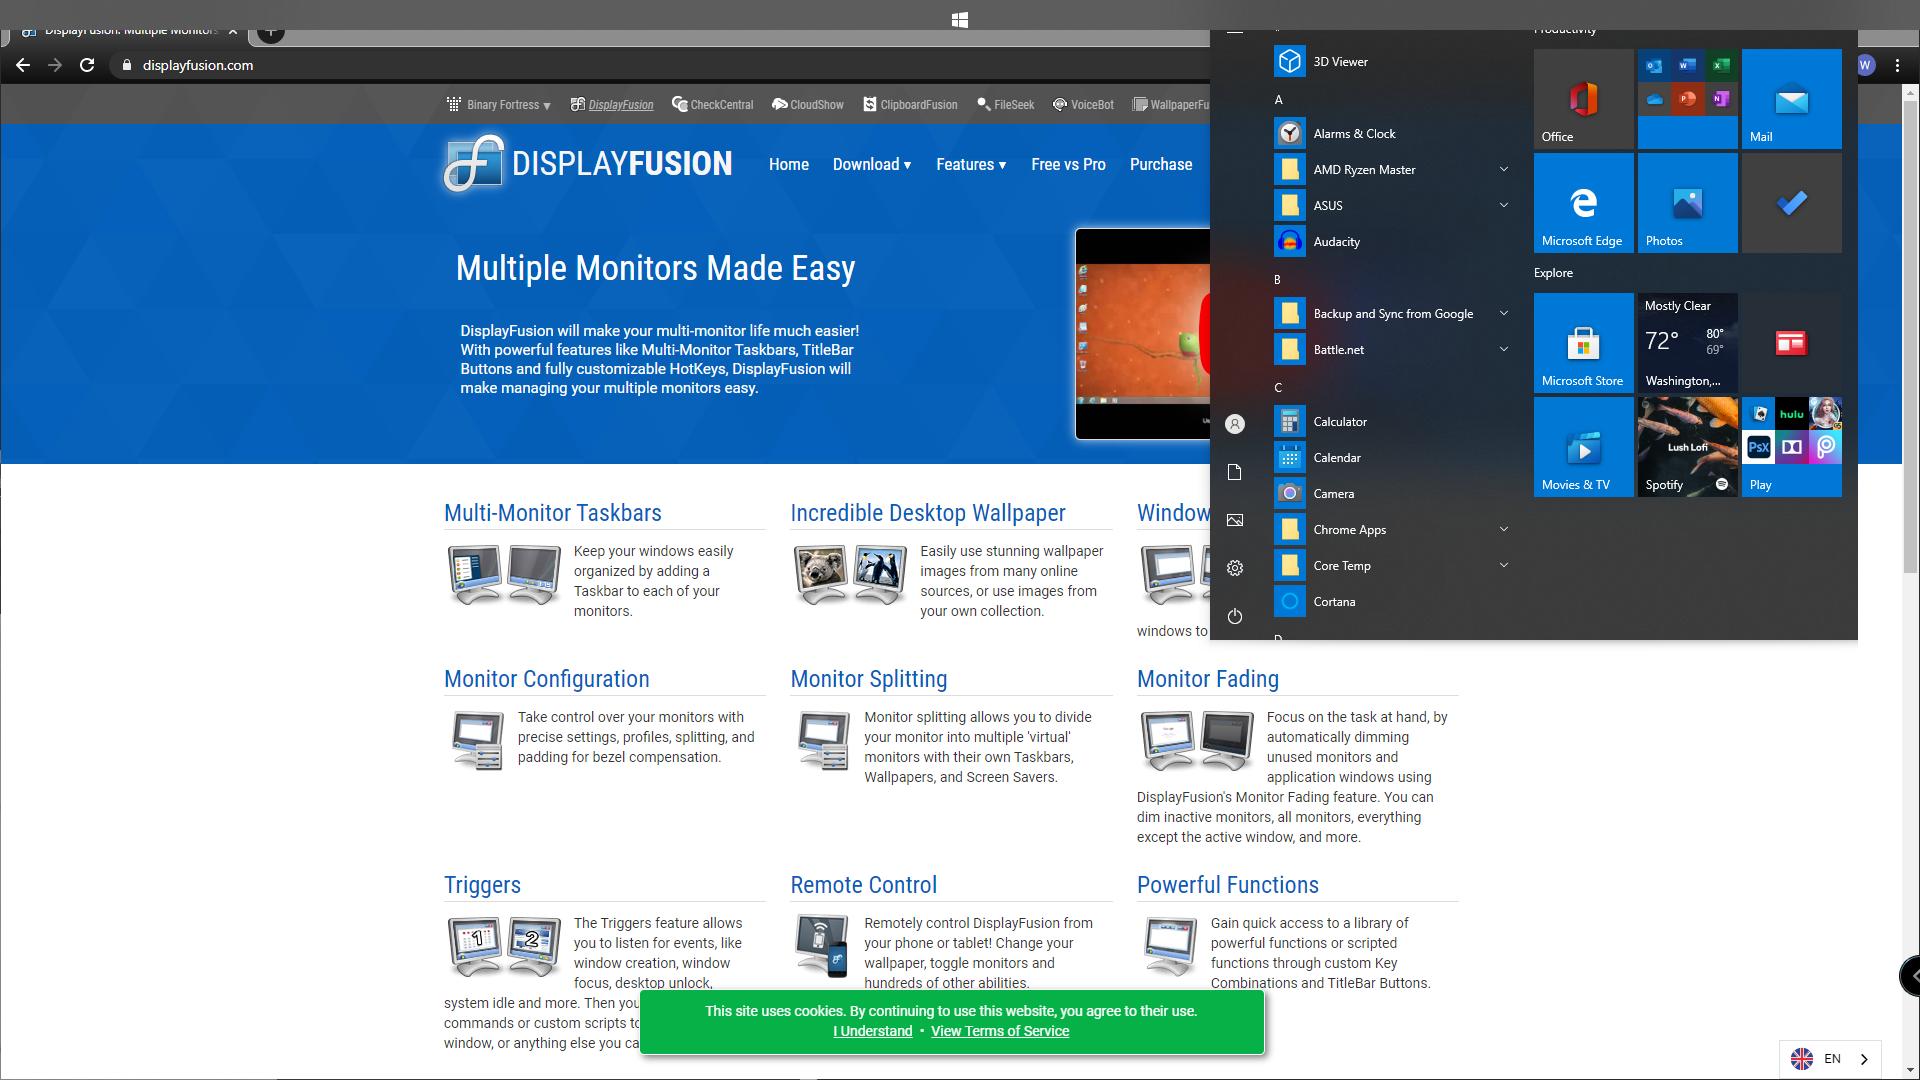 DisplayFusionWindows10MissingTaskbarBrokenStartButton.png